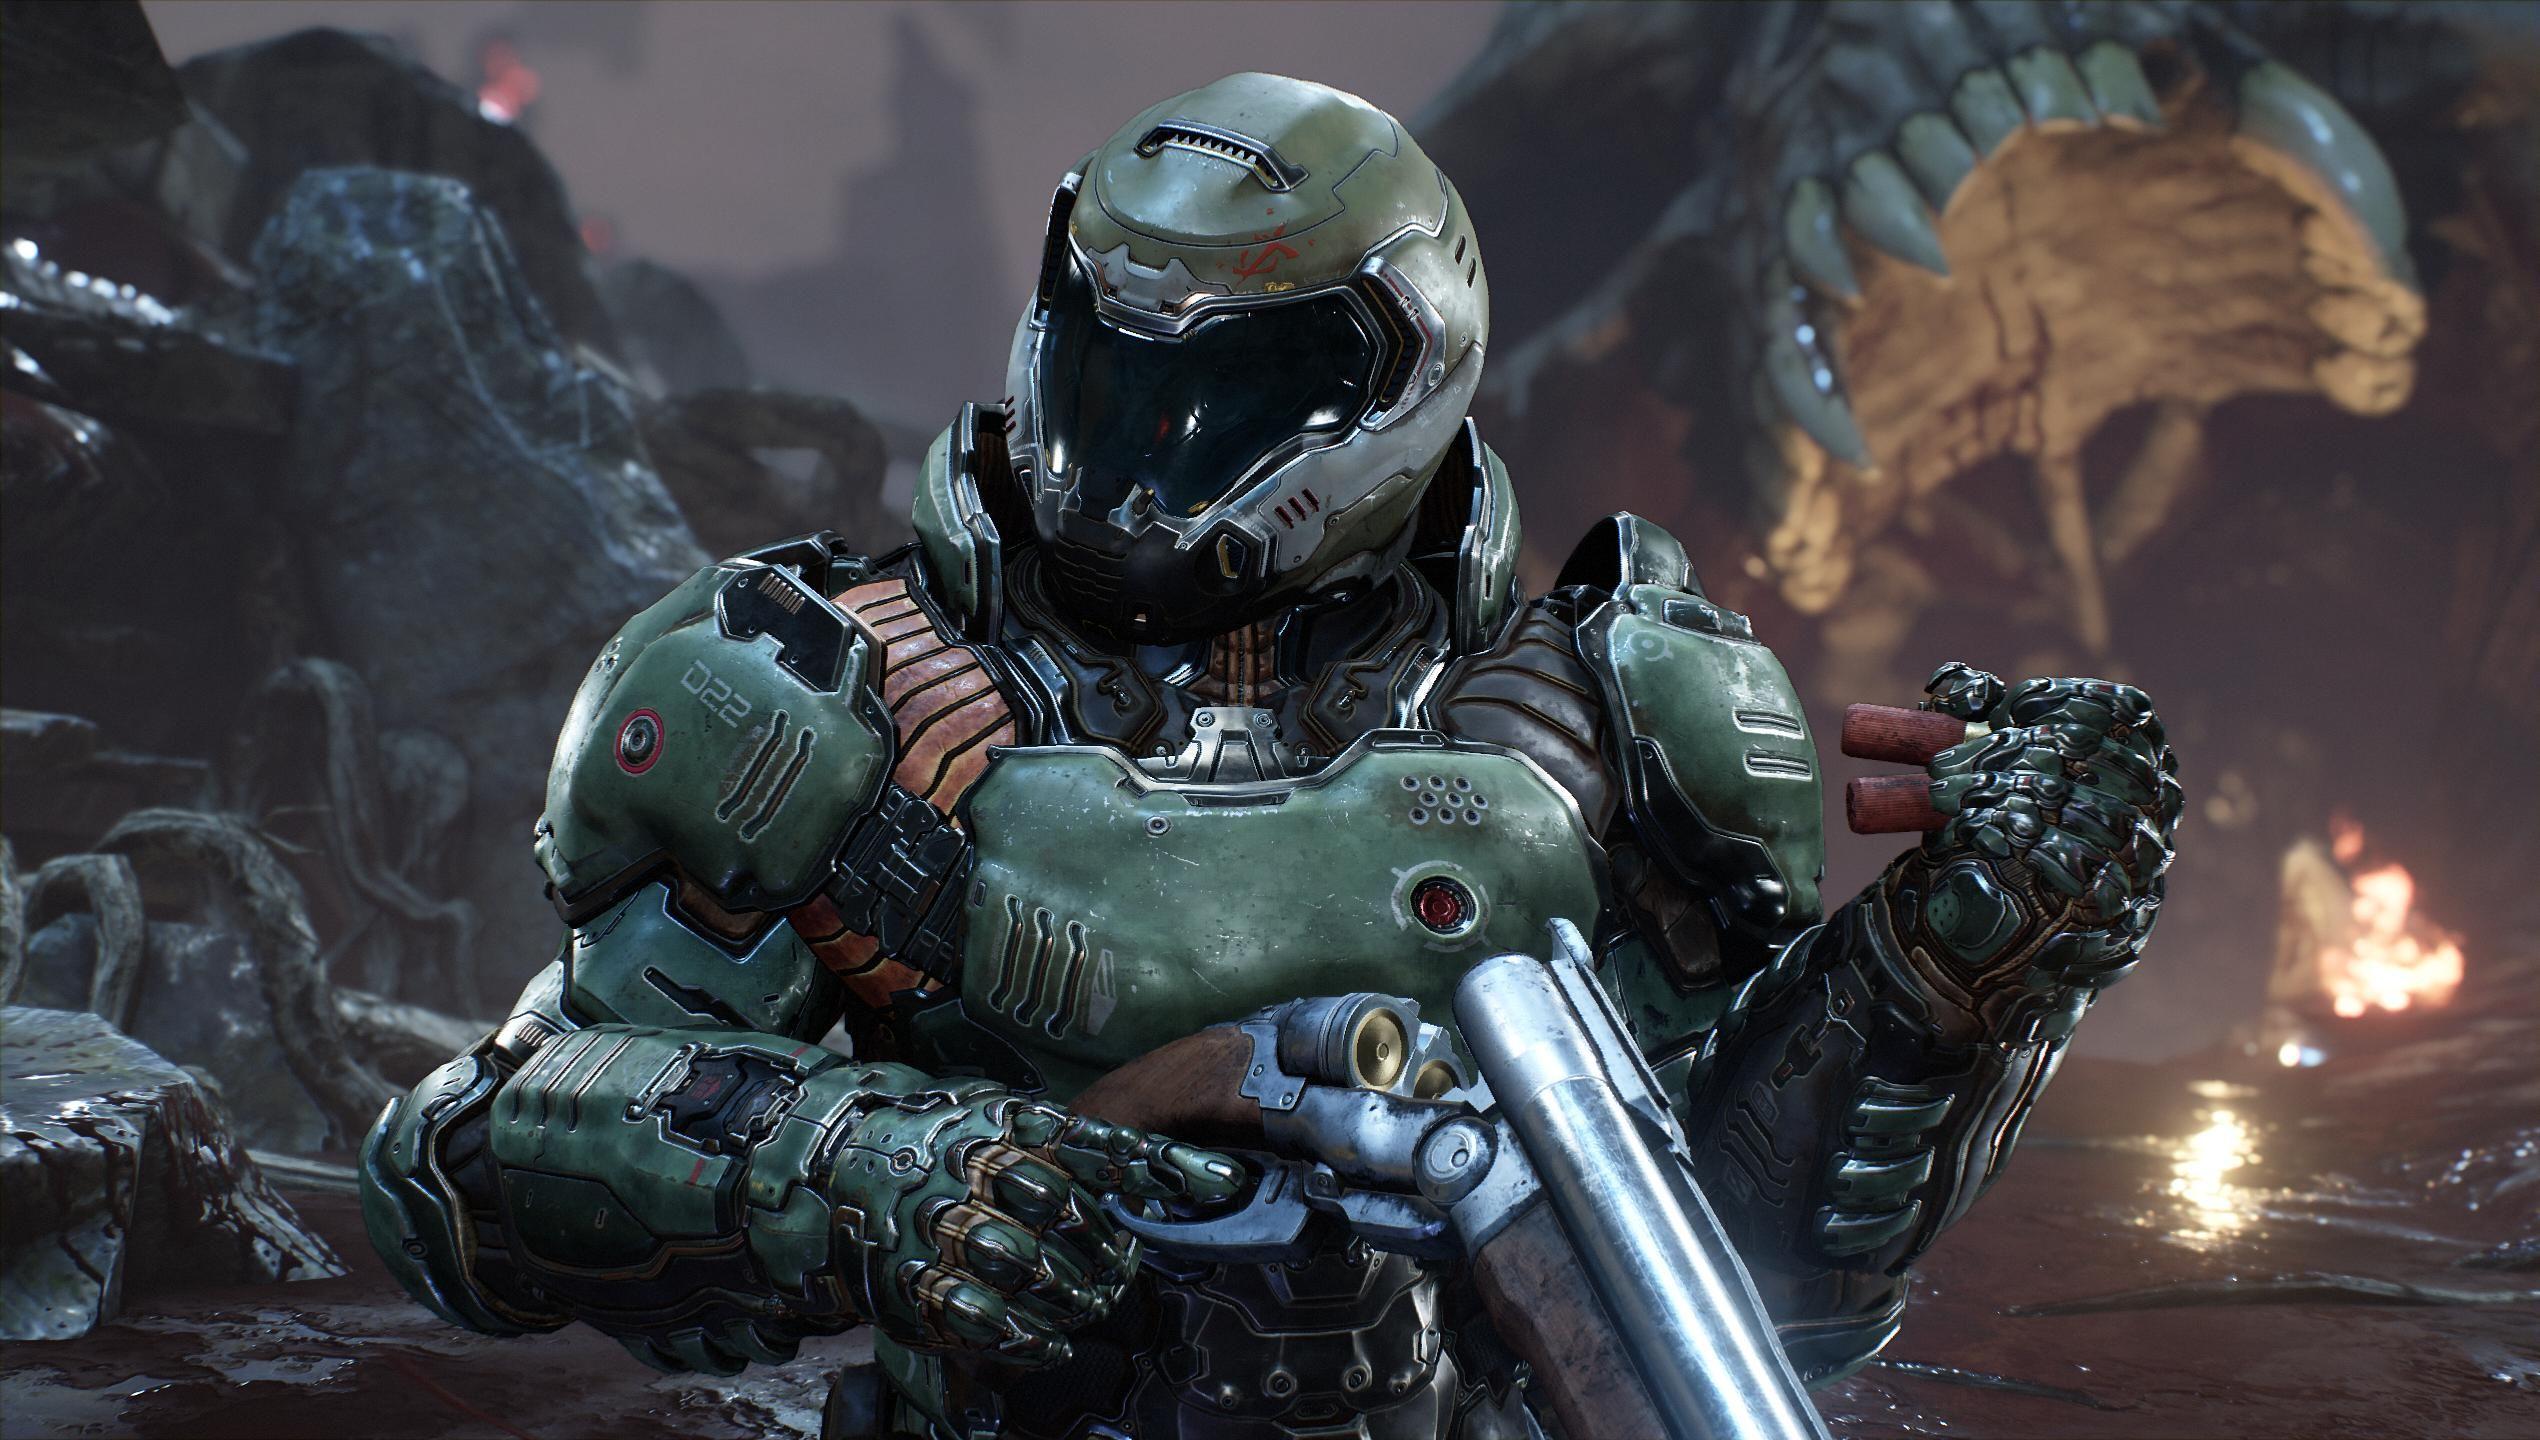 DOOM QuakeCon 2016 Wallpaper | GAMING | Doom movie, Doom